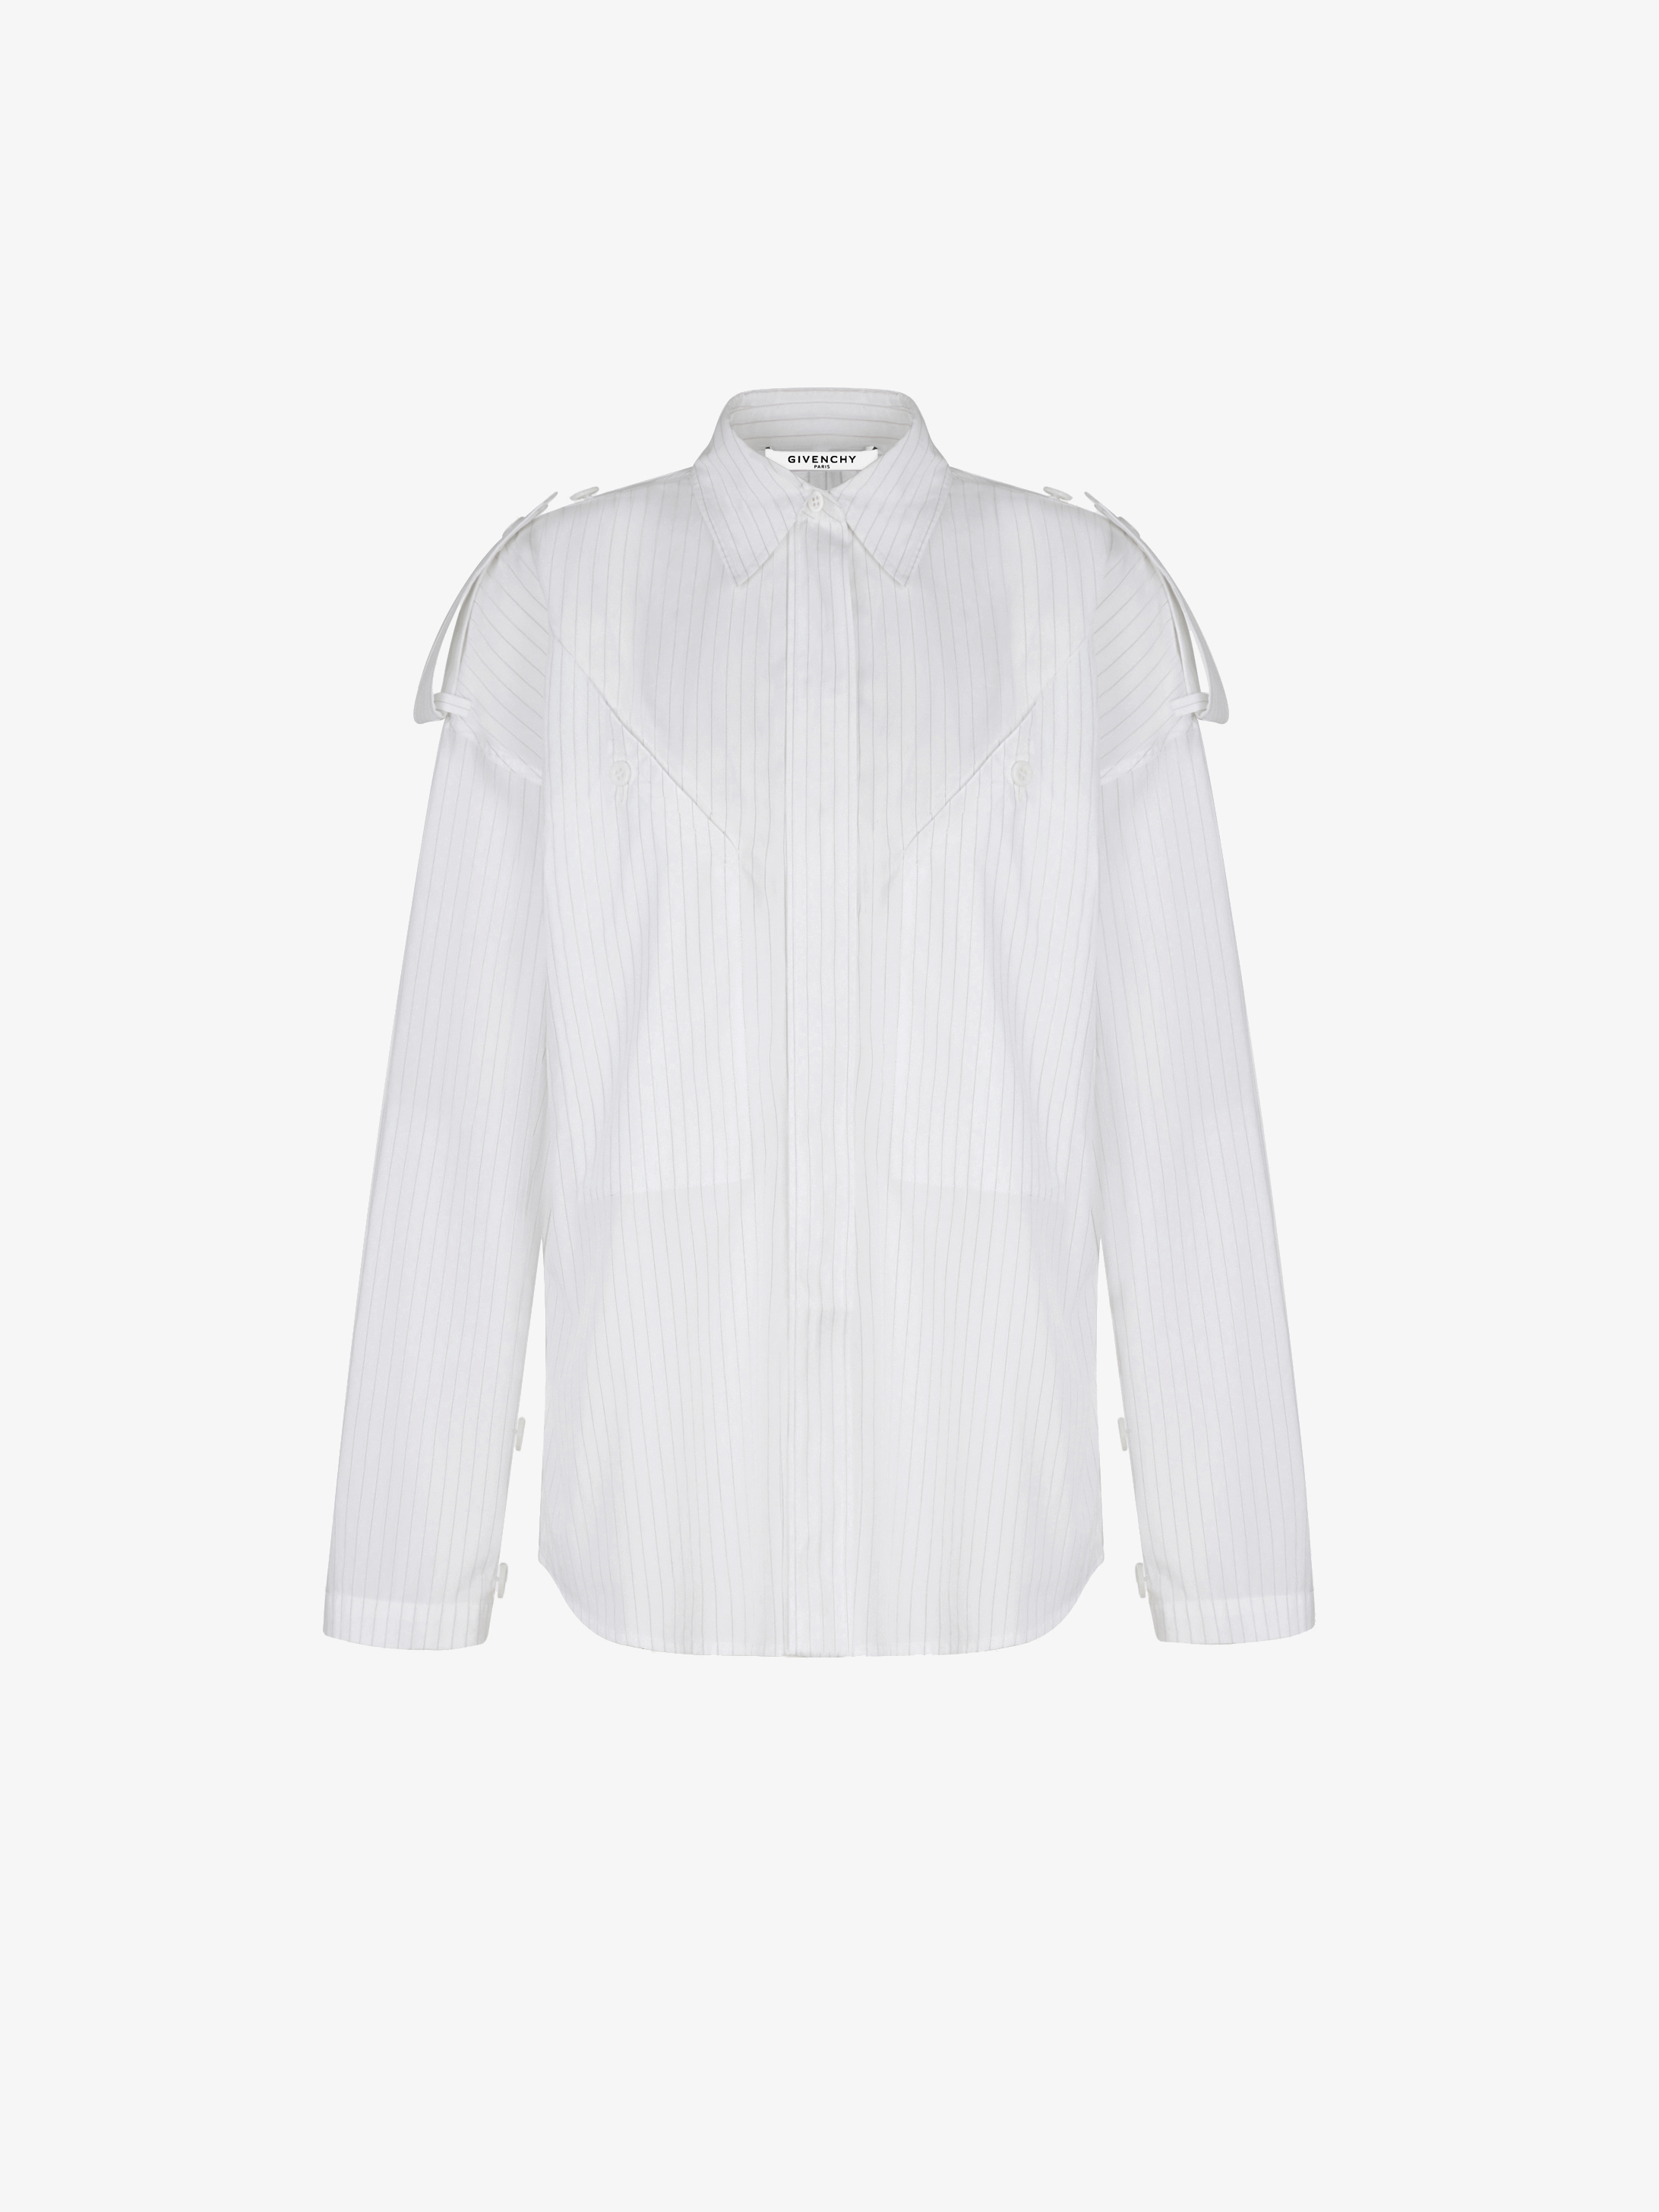 Striped military mandarin collar shirt